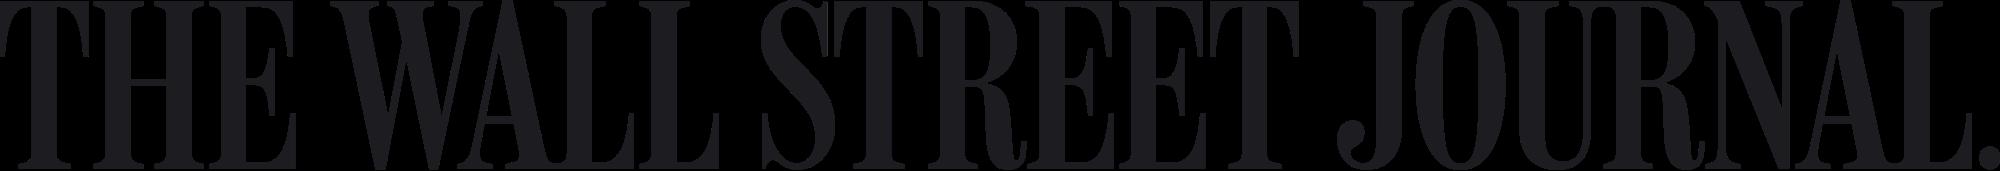 Wall Street Journal Sheena Iyengar